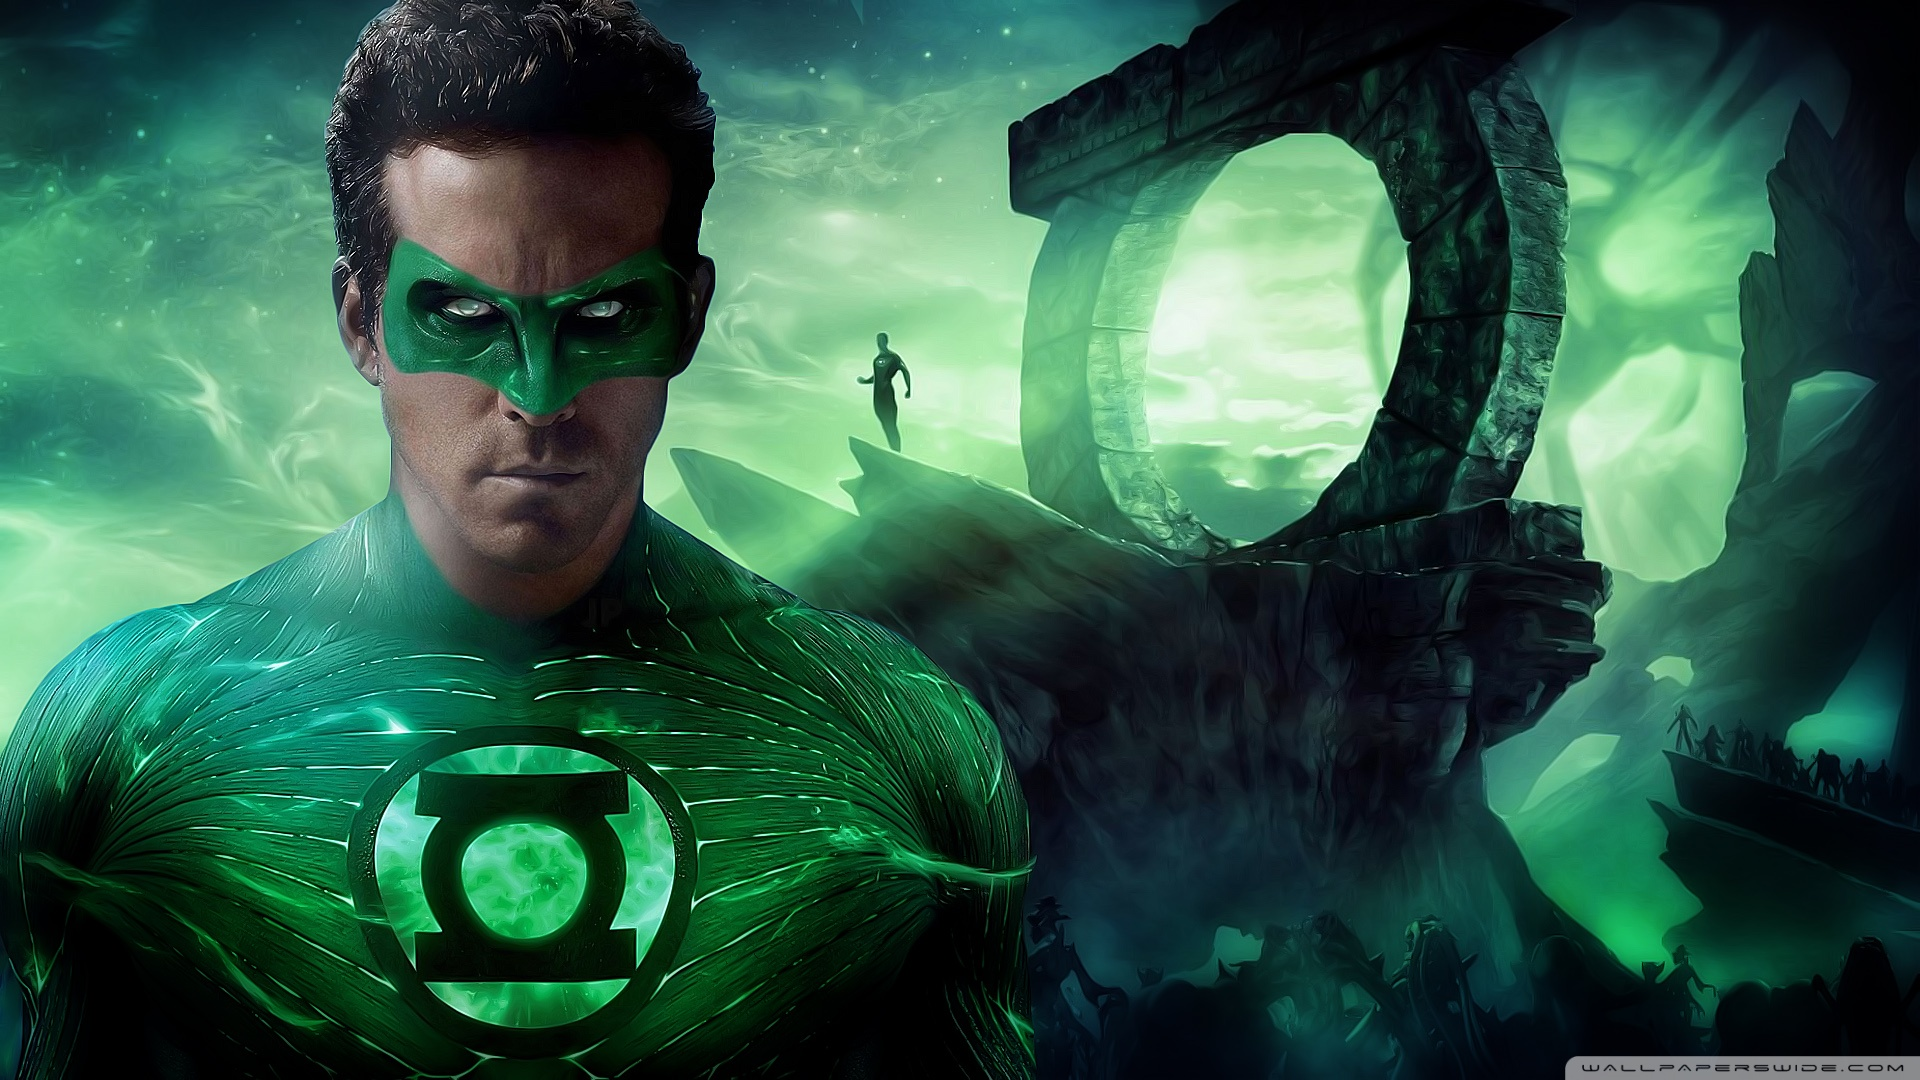 green-lantern-movie_00443612.jpg